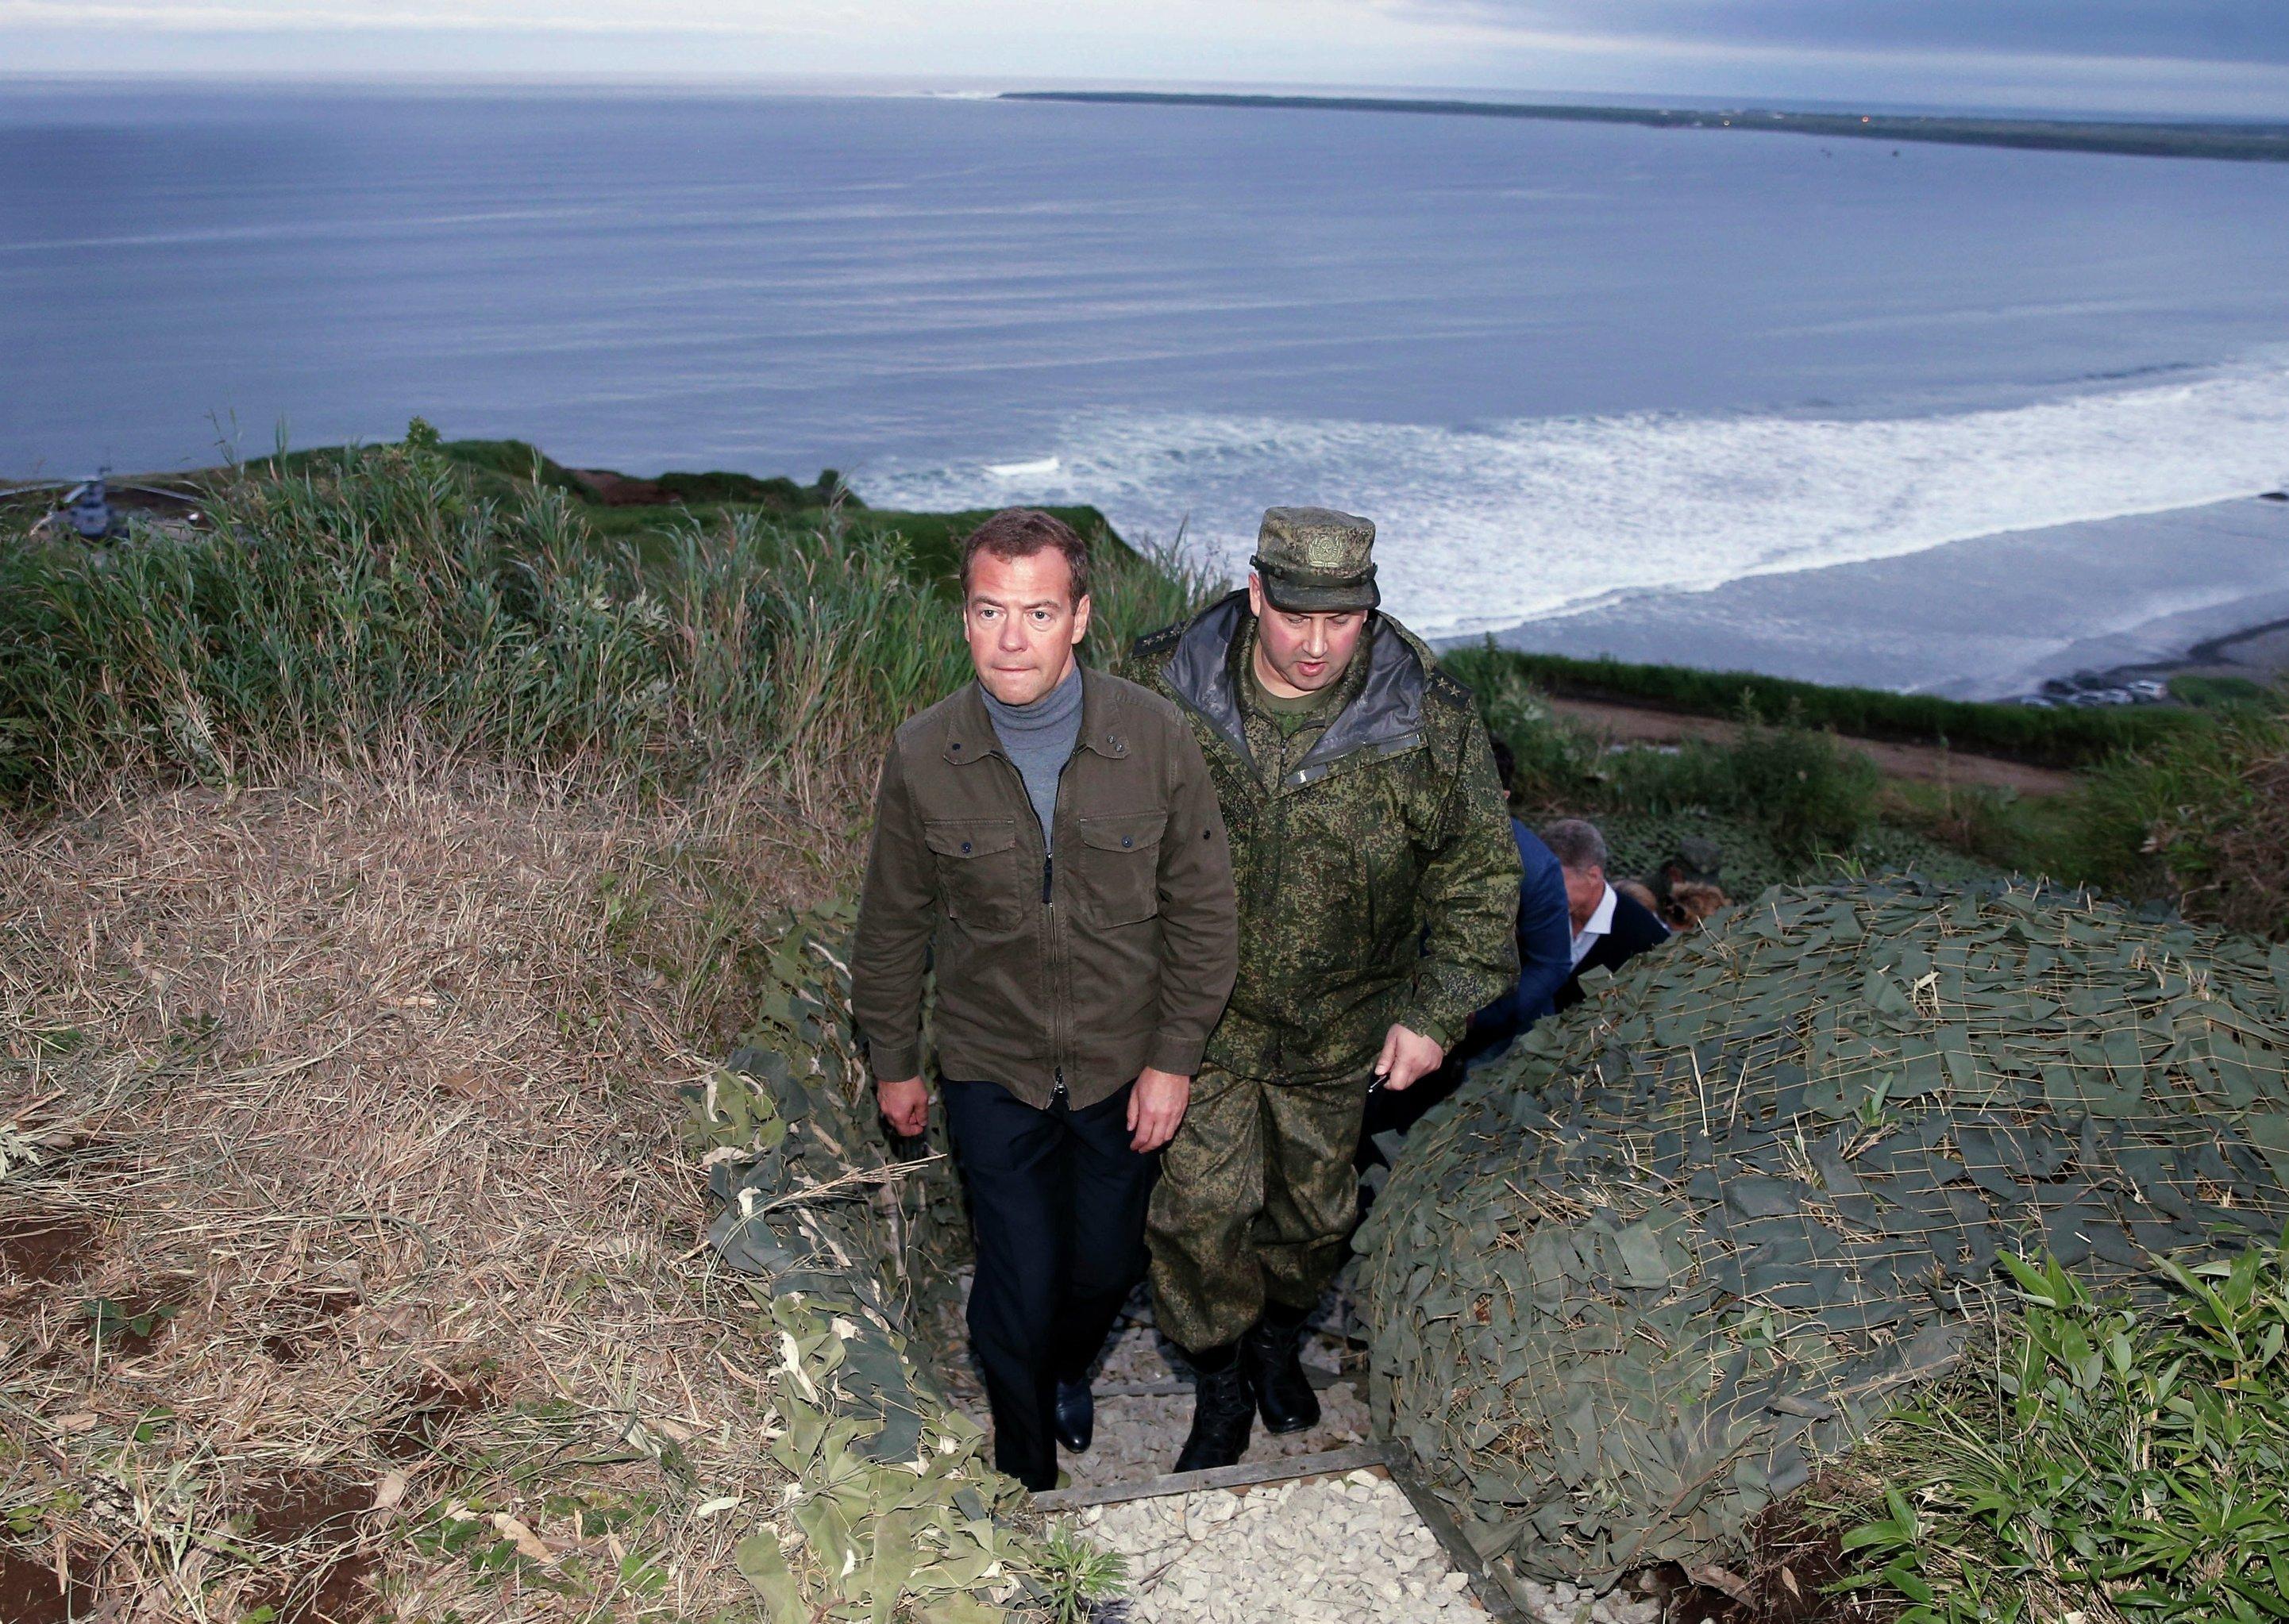 Prime Minister Medvedev visiting the Kuril Islands, August 2015.